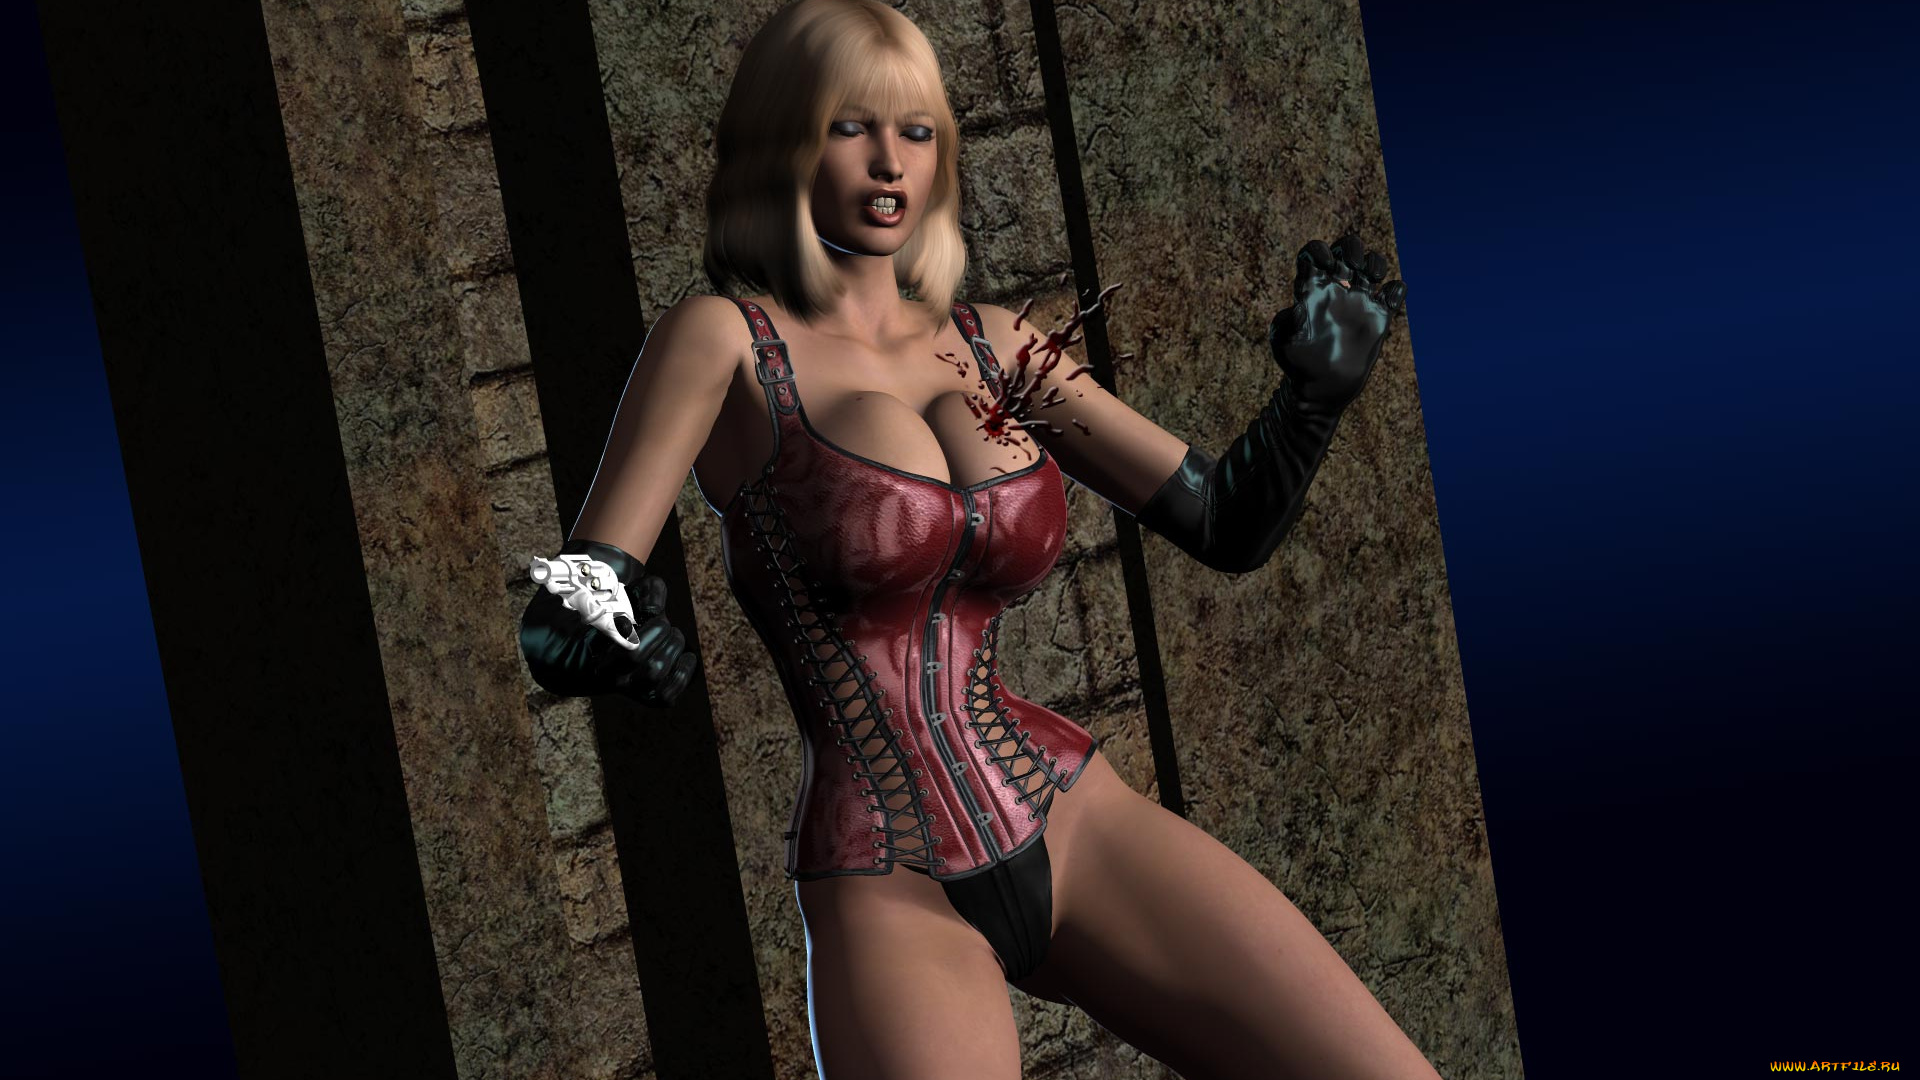 Playboy nancy erminia nude